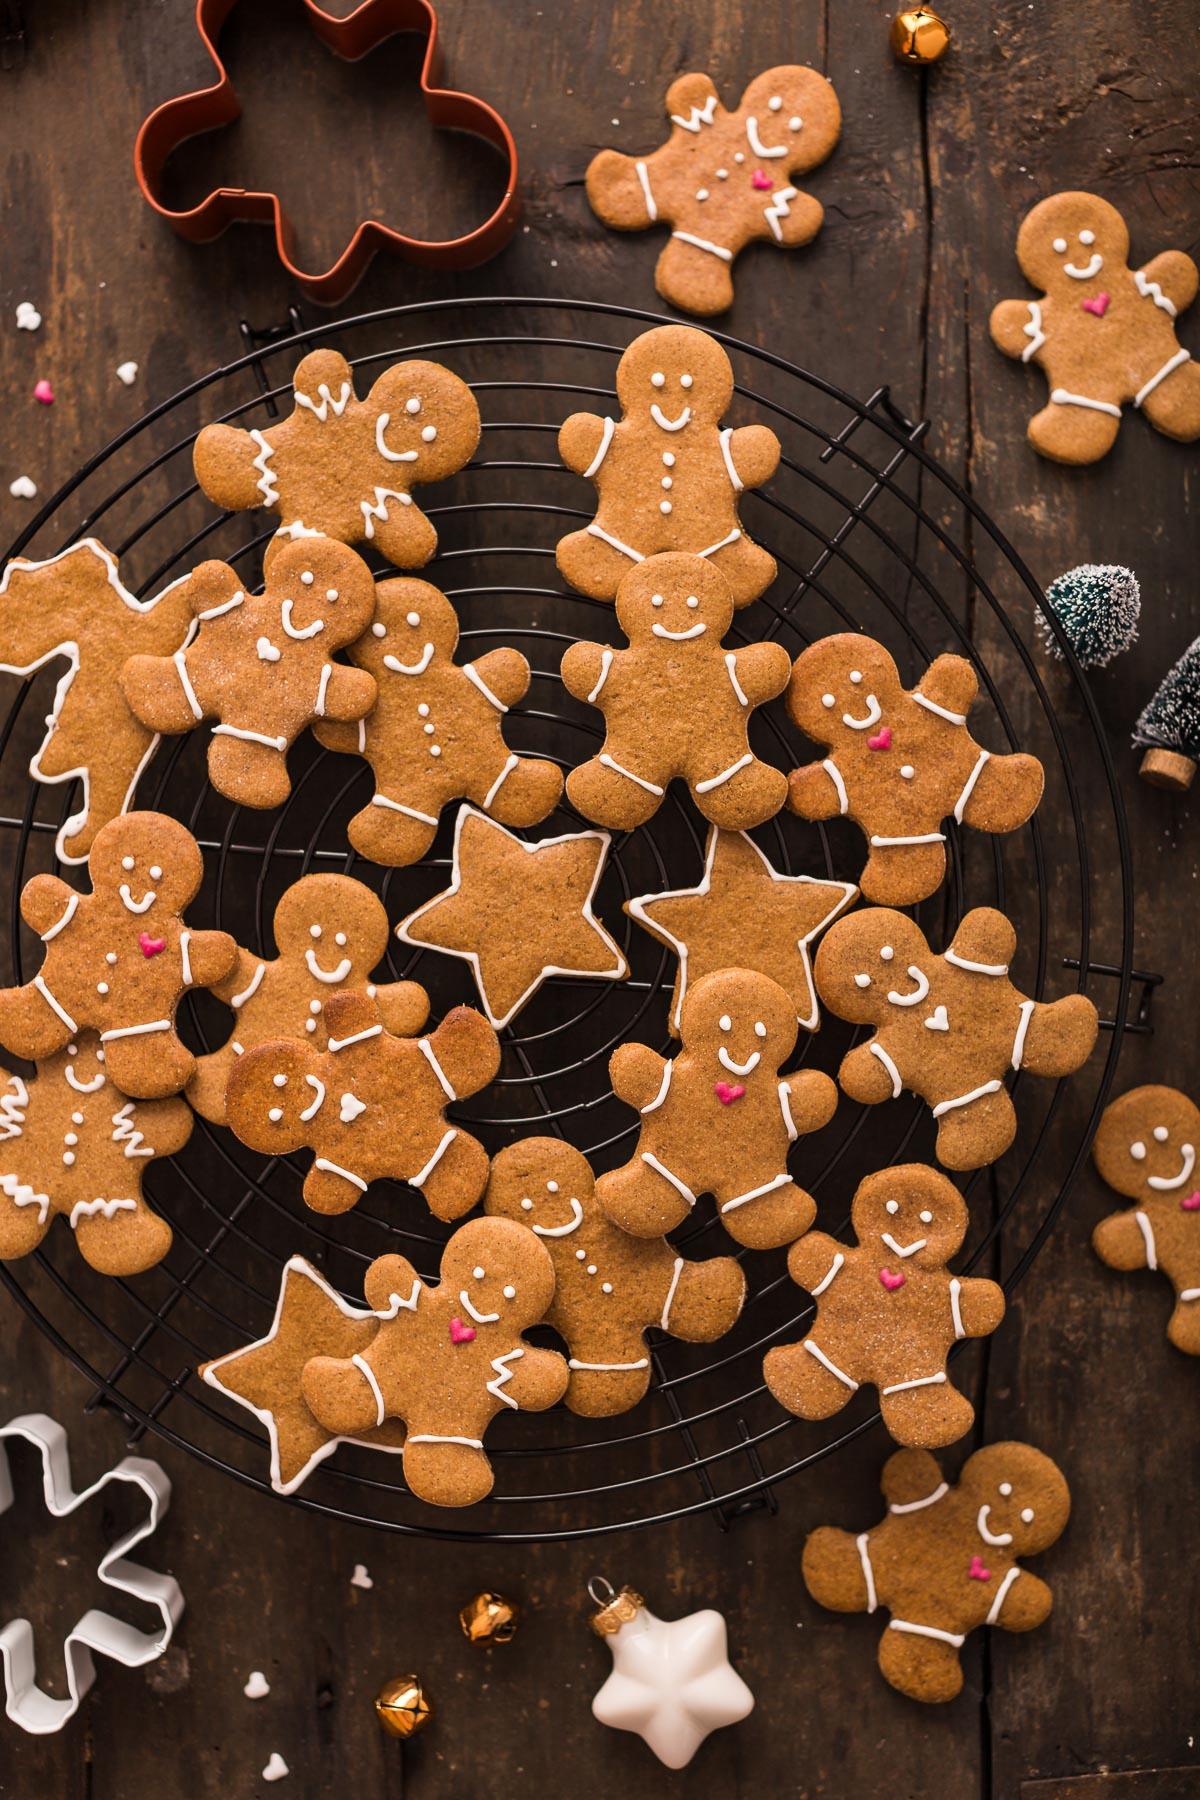 delicious vegan gingerbread man vegani - biscotti pan di zenzero vegani croccanti leggeri e friabili #vegan #gingerbread man cookies biscotti di Natale Xmas #cookies